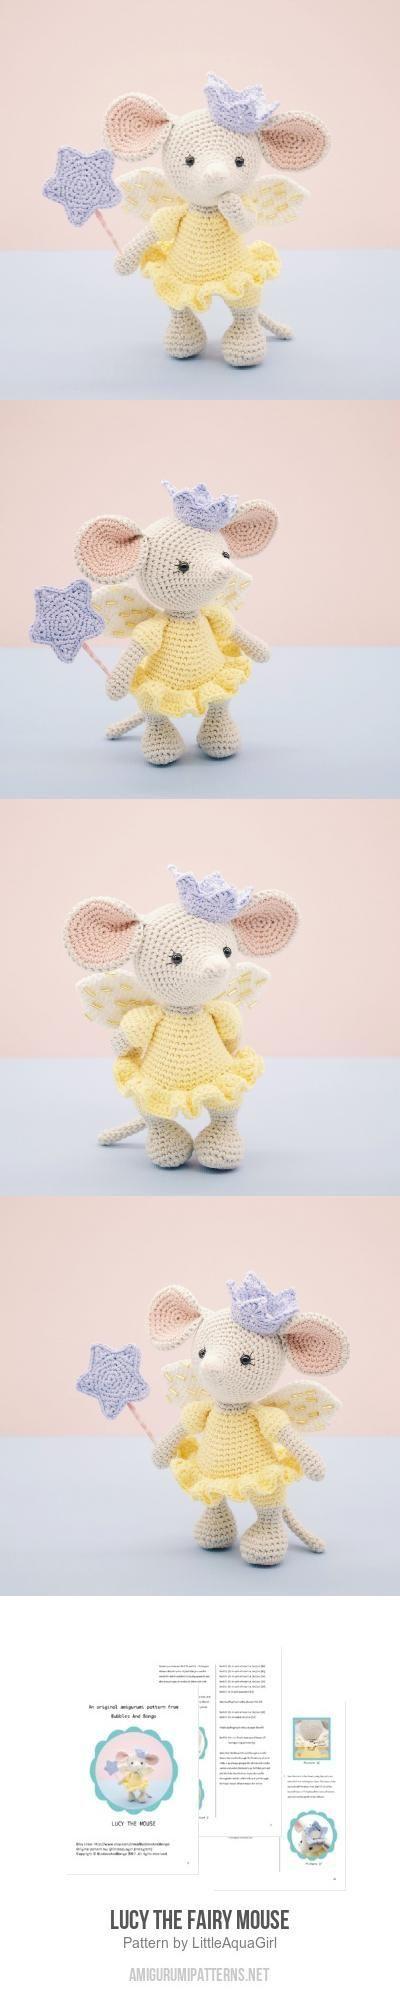 Lucy the Fairy Mouse amigurumi pattern #crochettoys | Амигурами ...